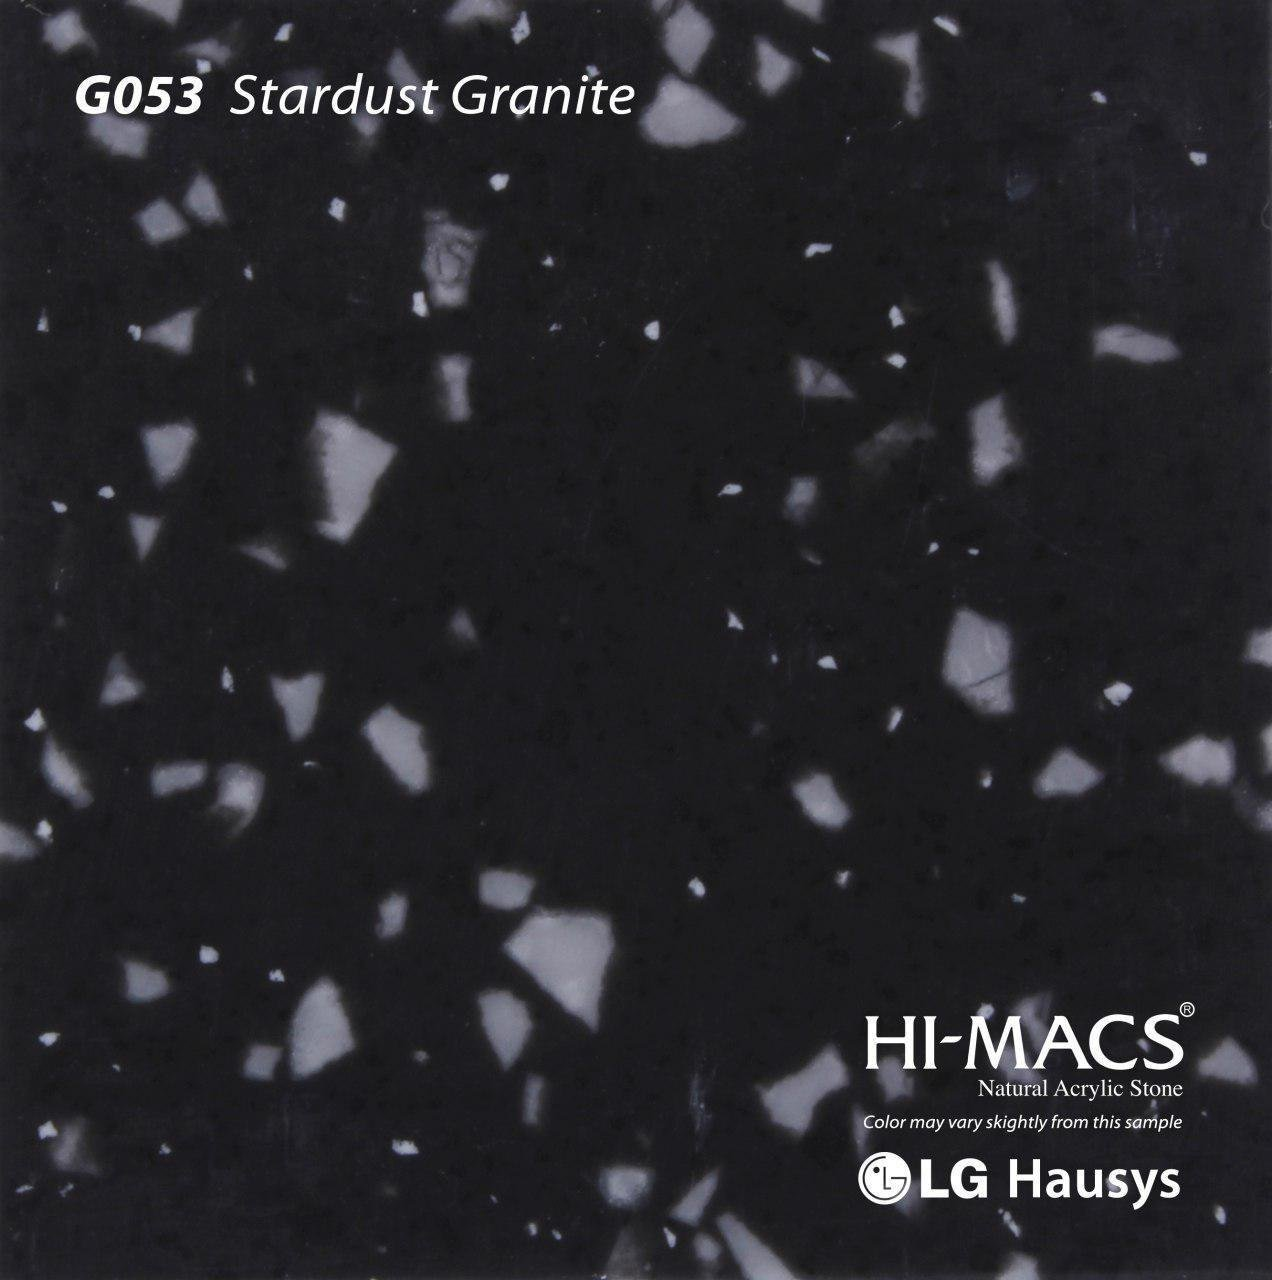 G053 LG